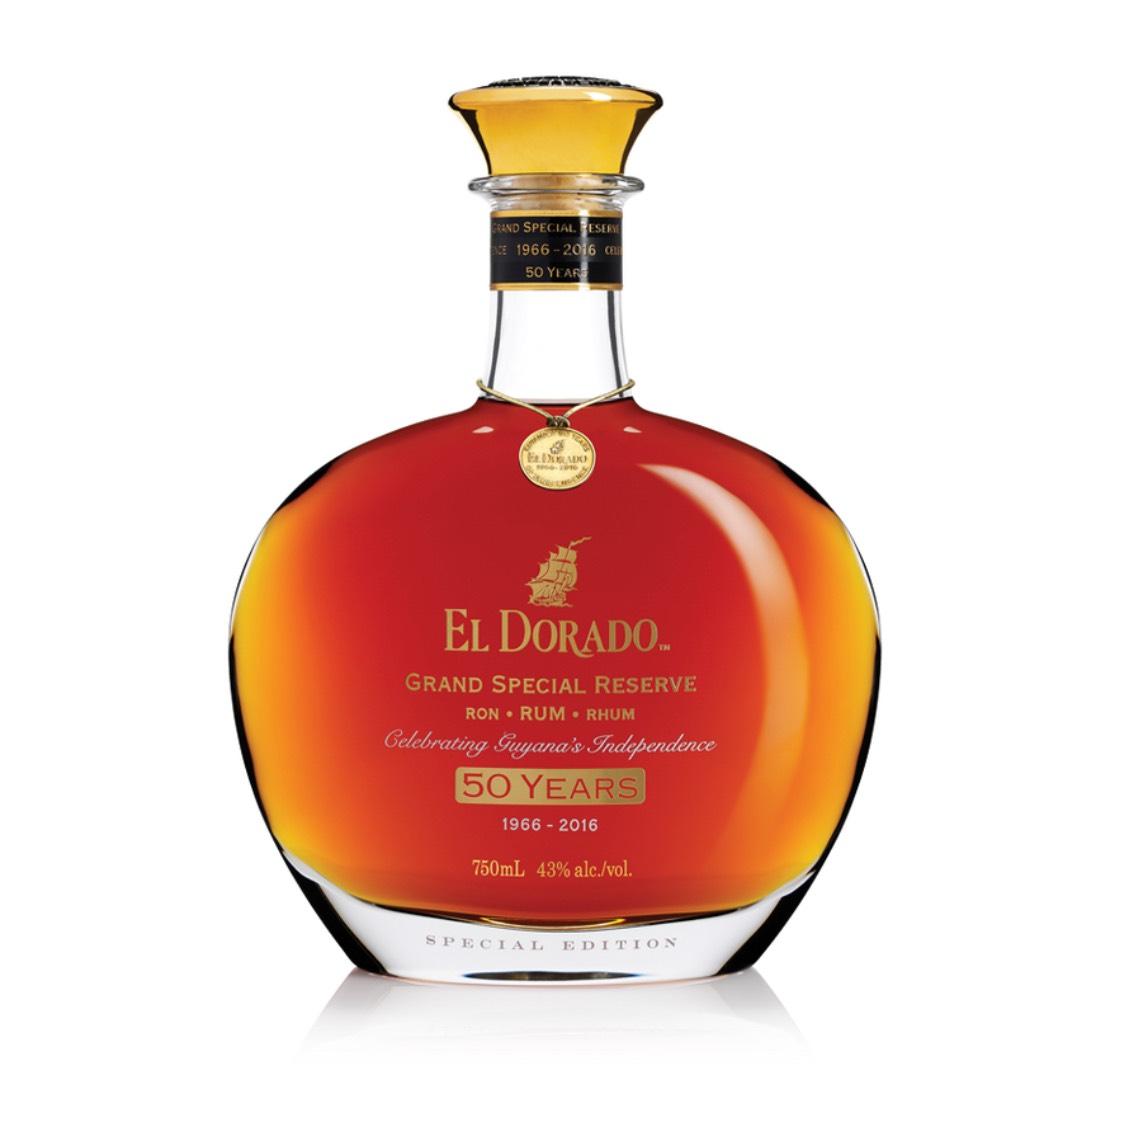 Bottle image of El Dorado Grand Special Reserve